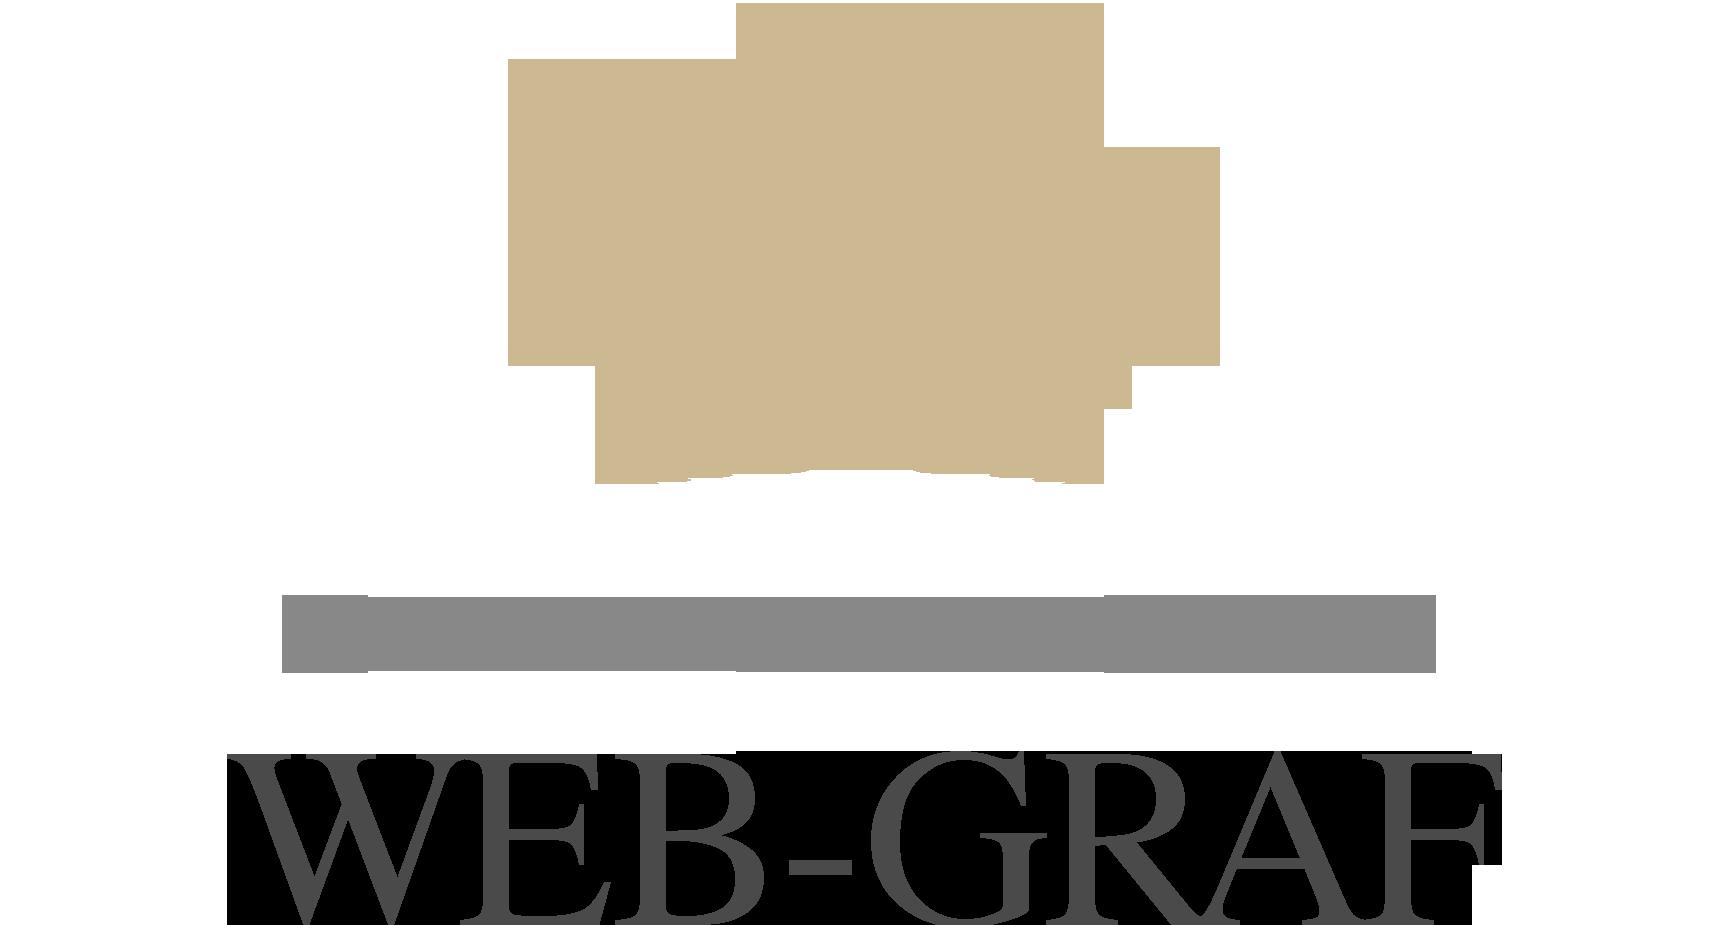 WEB-GRAF Grafik- und Webdesign